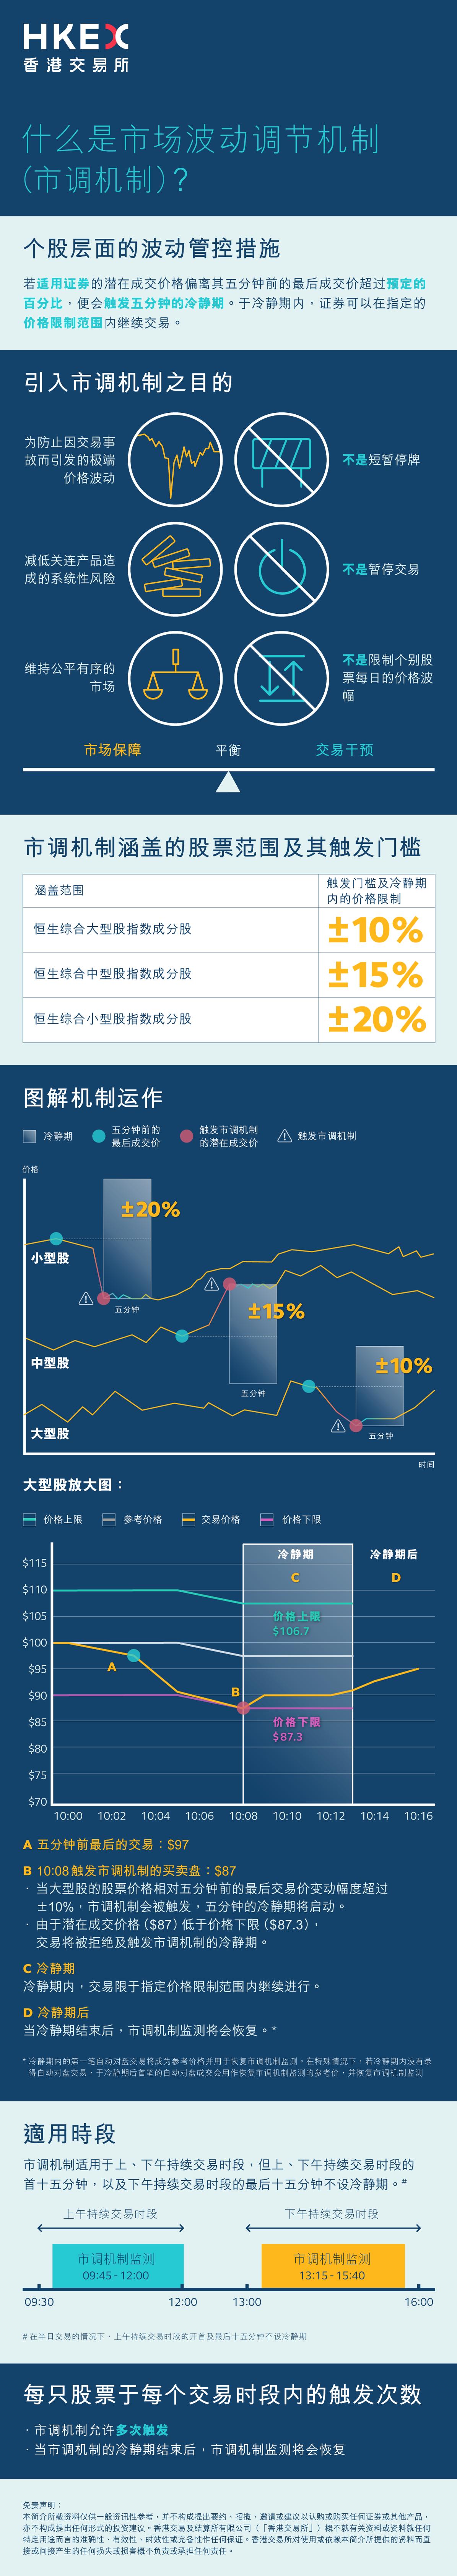 VCMP2b_Infographic_c